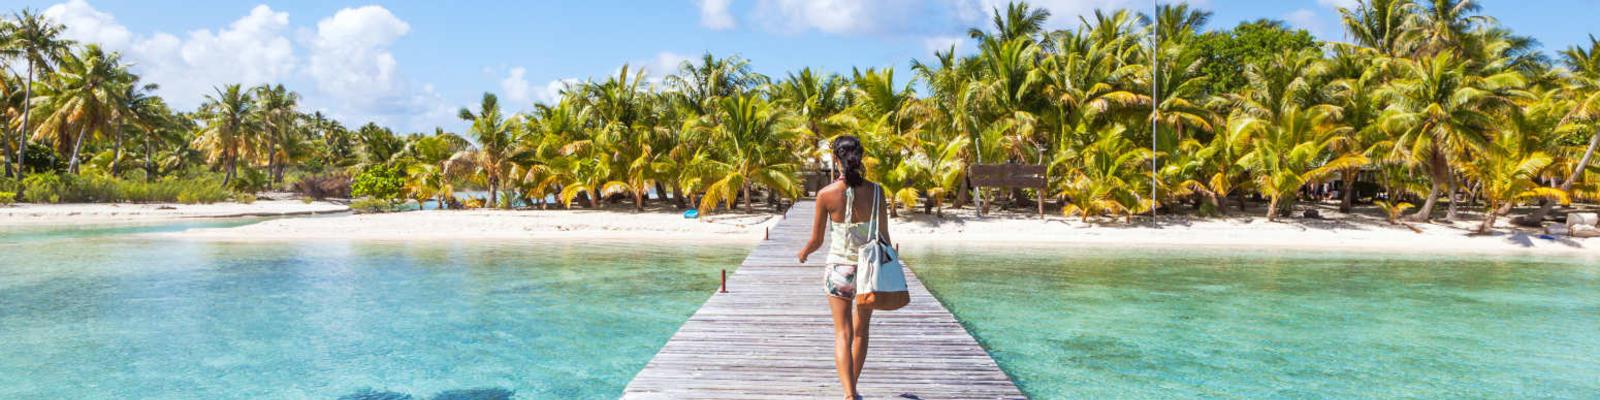 woman walking on boardwalk to tropical island